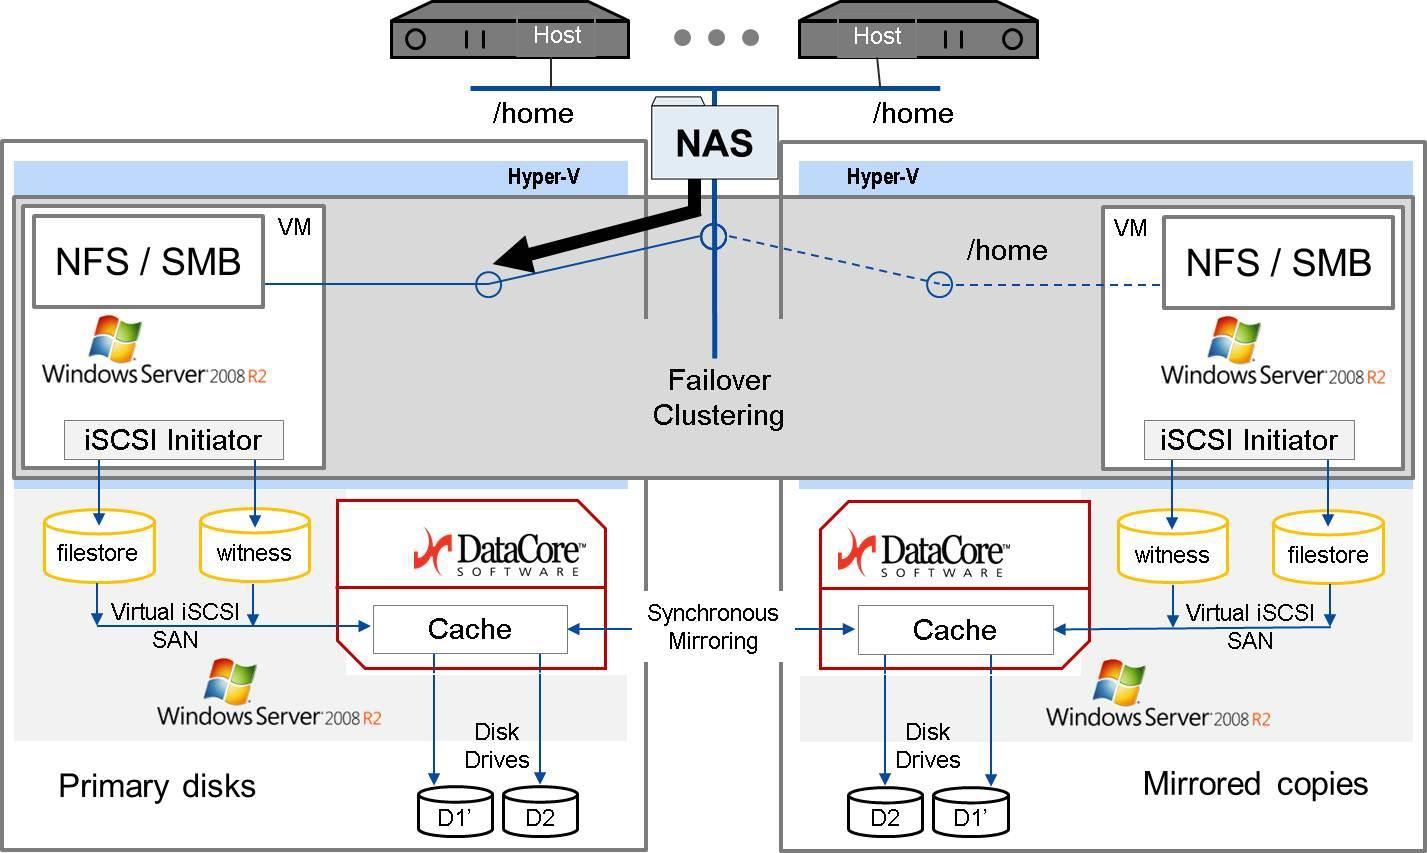 DataCore_NAS_Cluster_01